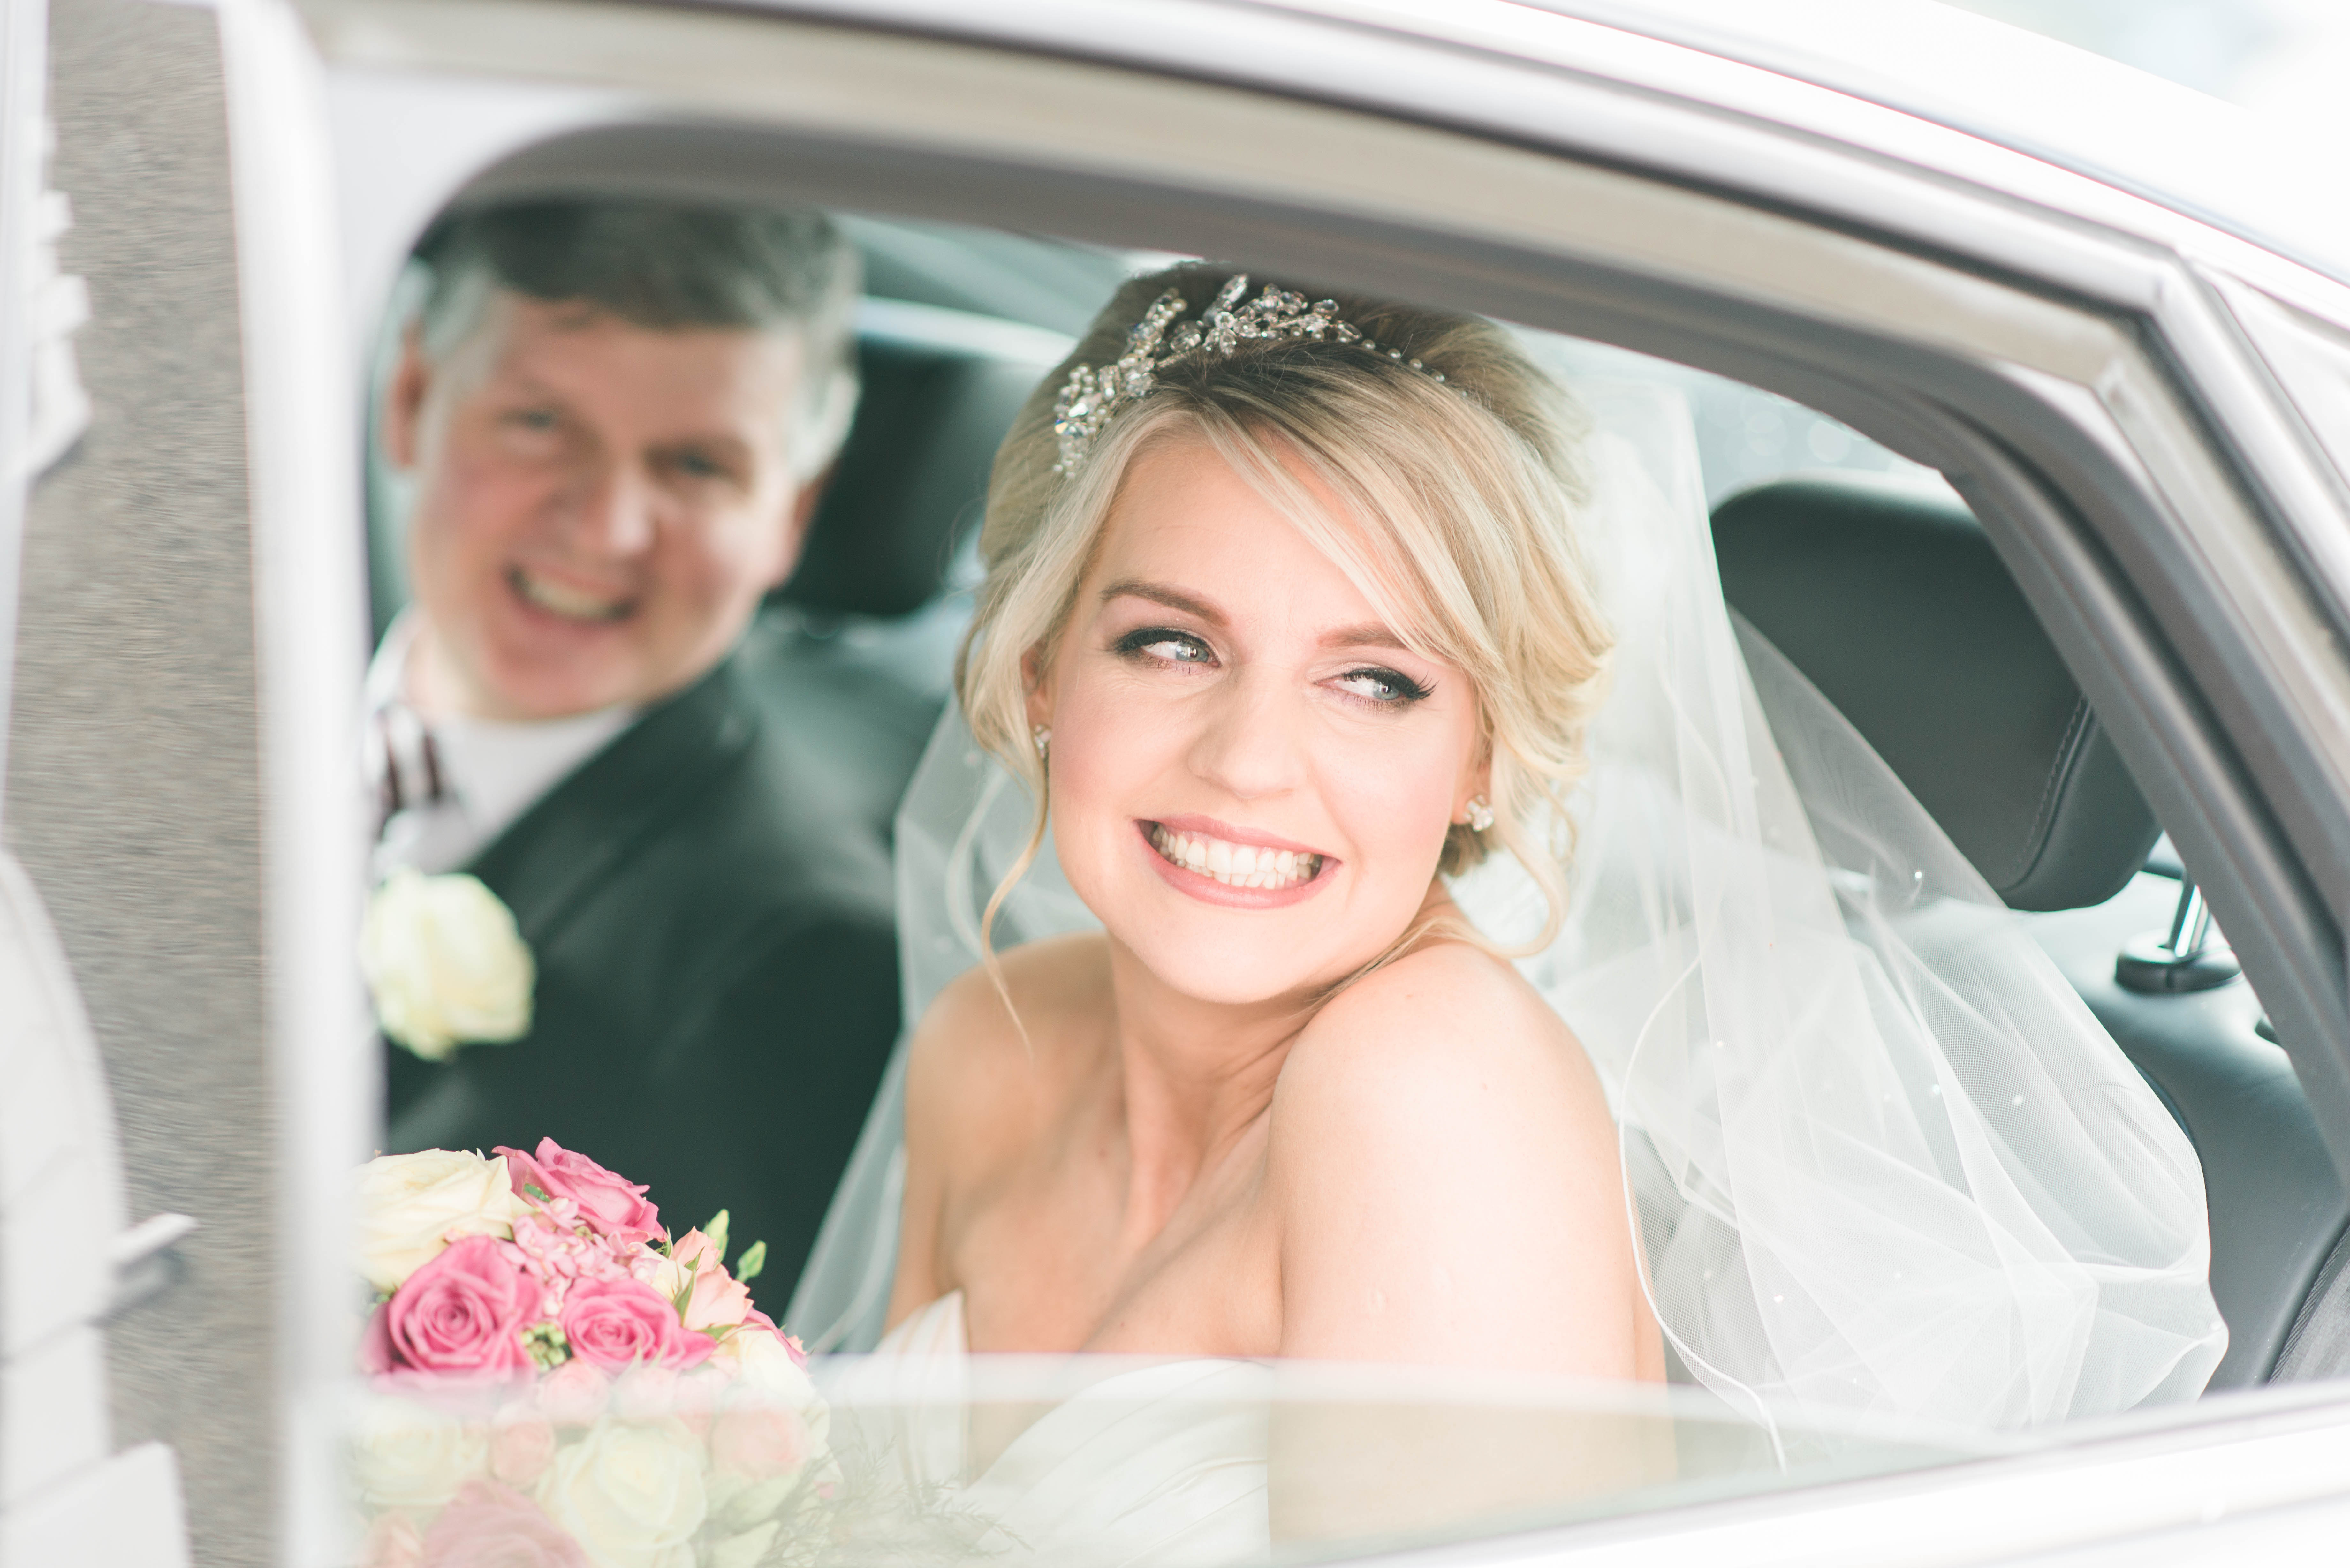 Pretty In Pink: Emma & Stephen's Sweet Spring Wedding